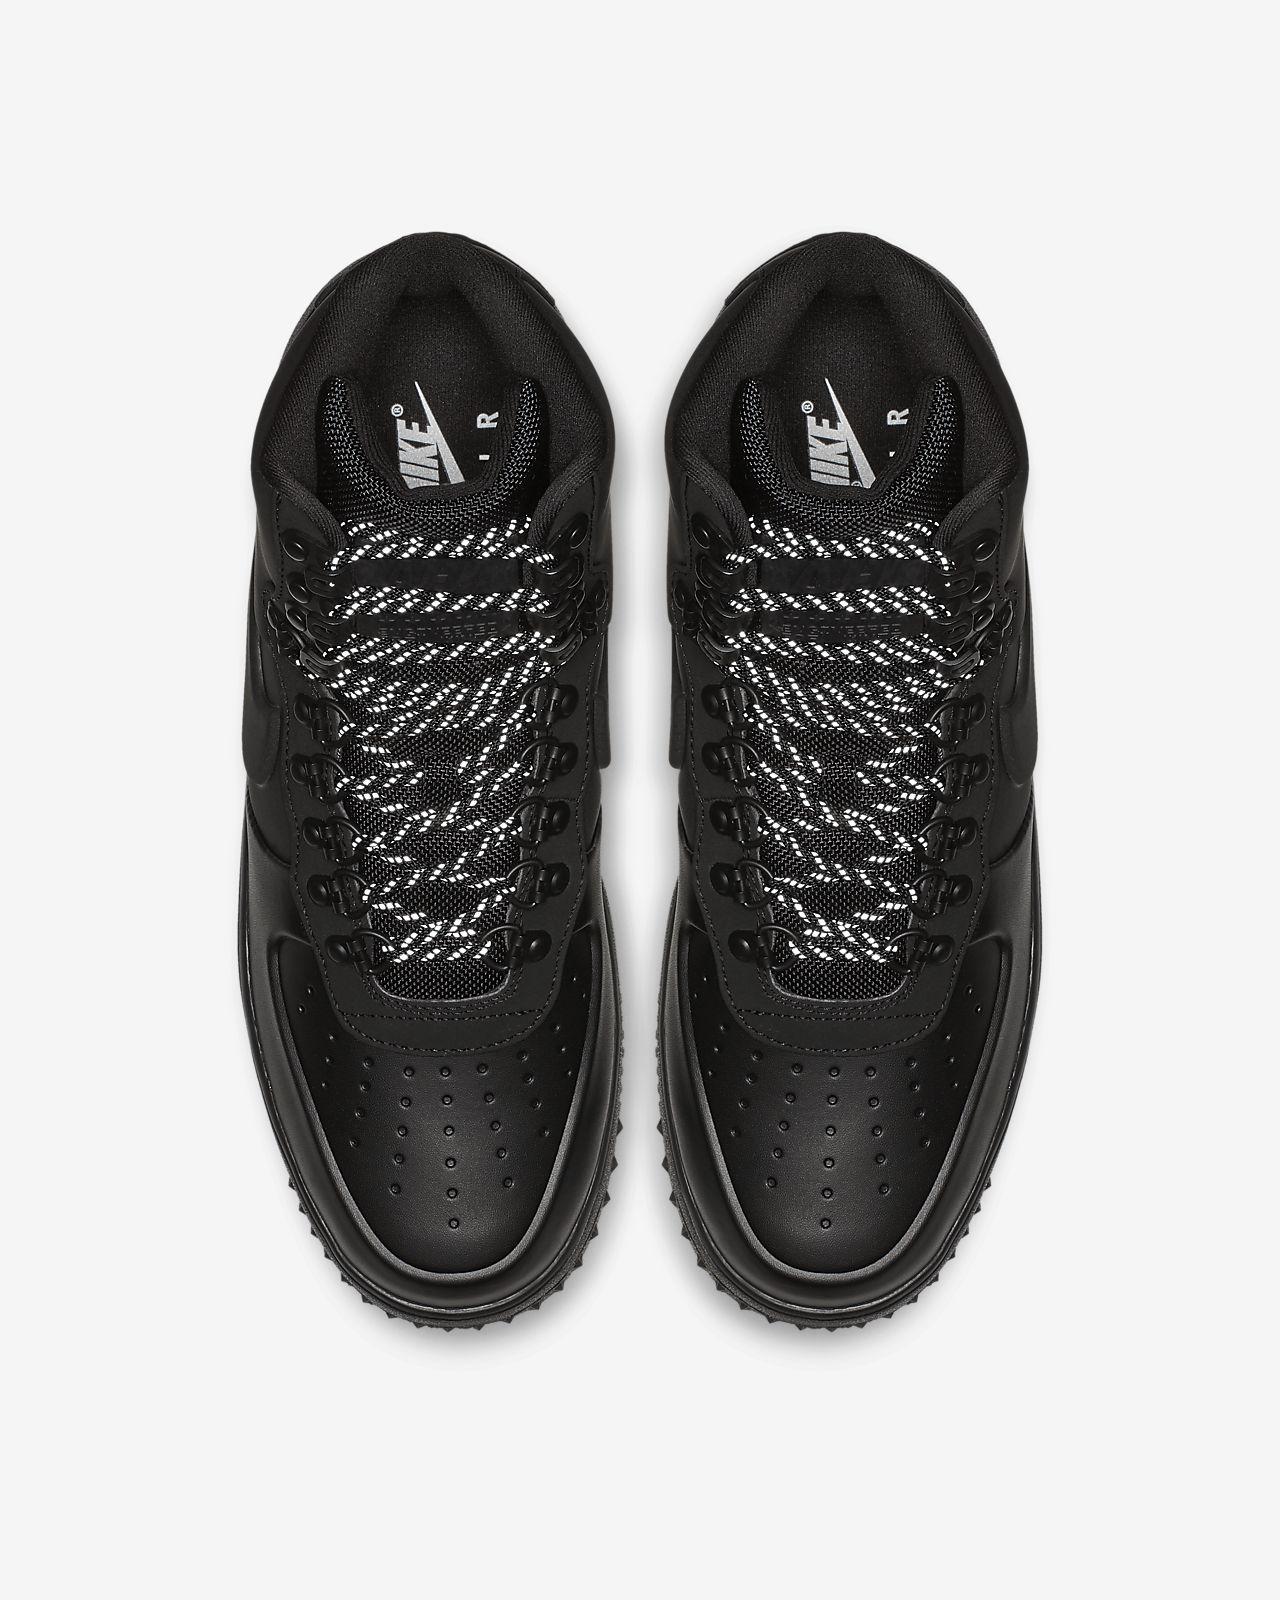 2018 neu Nike Schuhe für Herren Nike Lunar Force 1 Duckboot